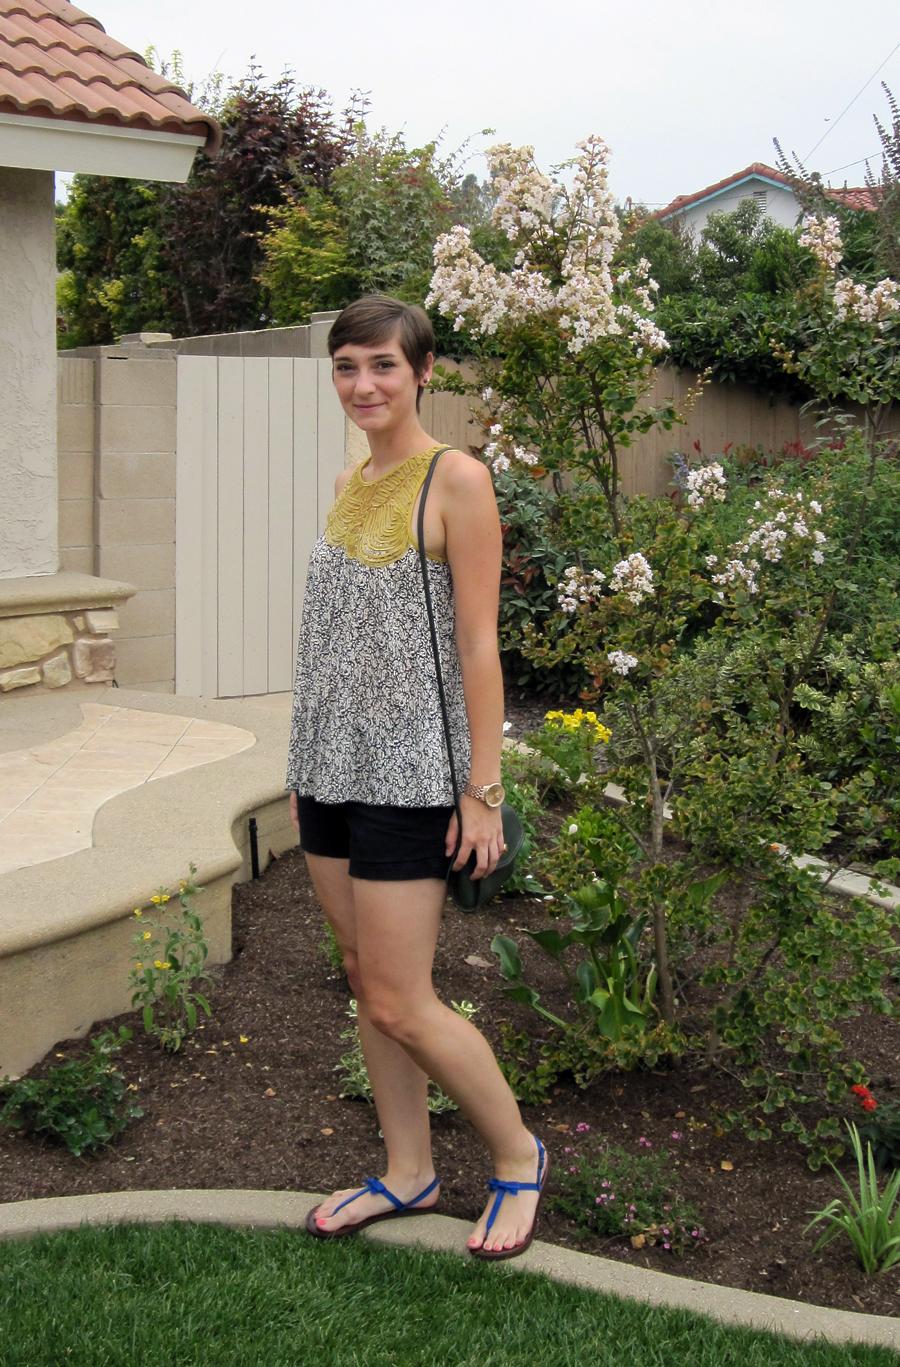 ootd - flowy top, black shorts, blue sandals